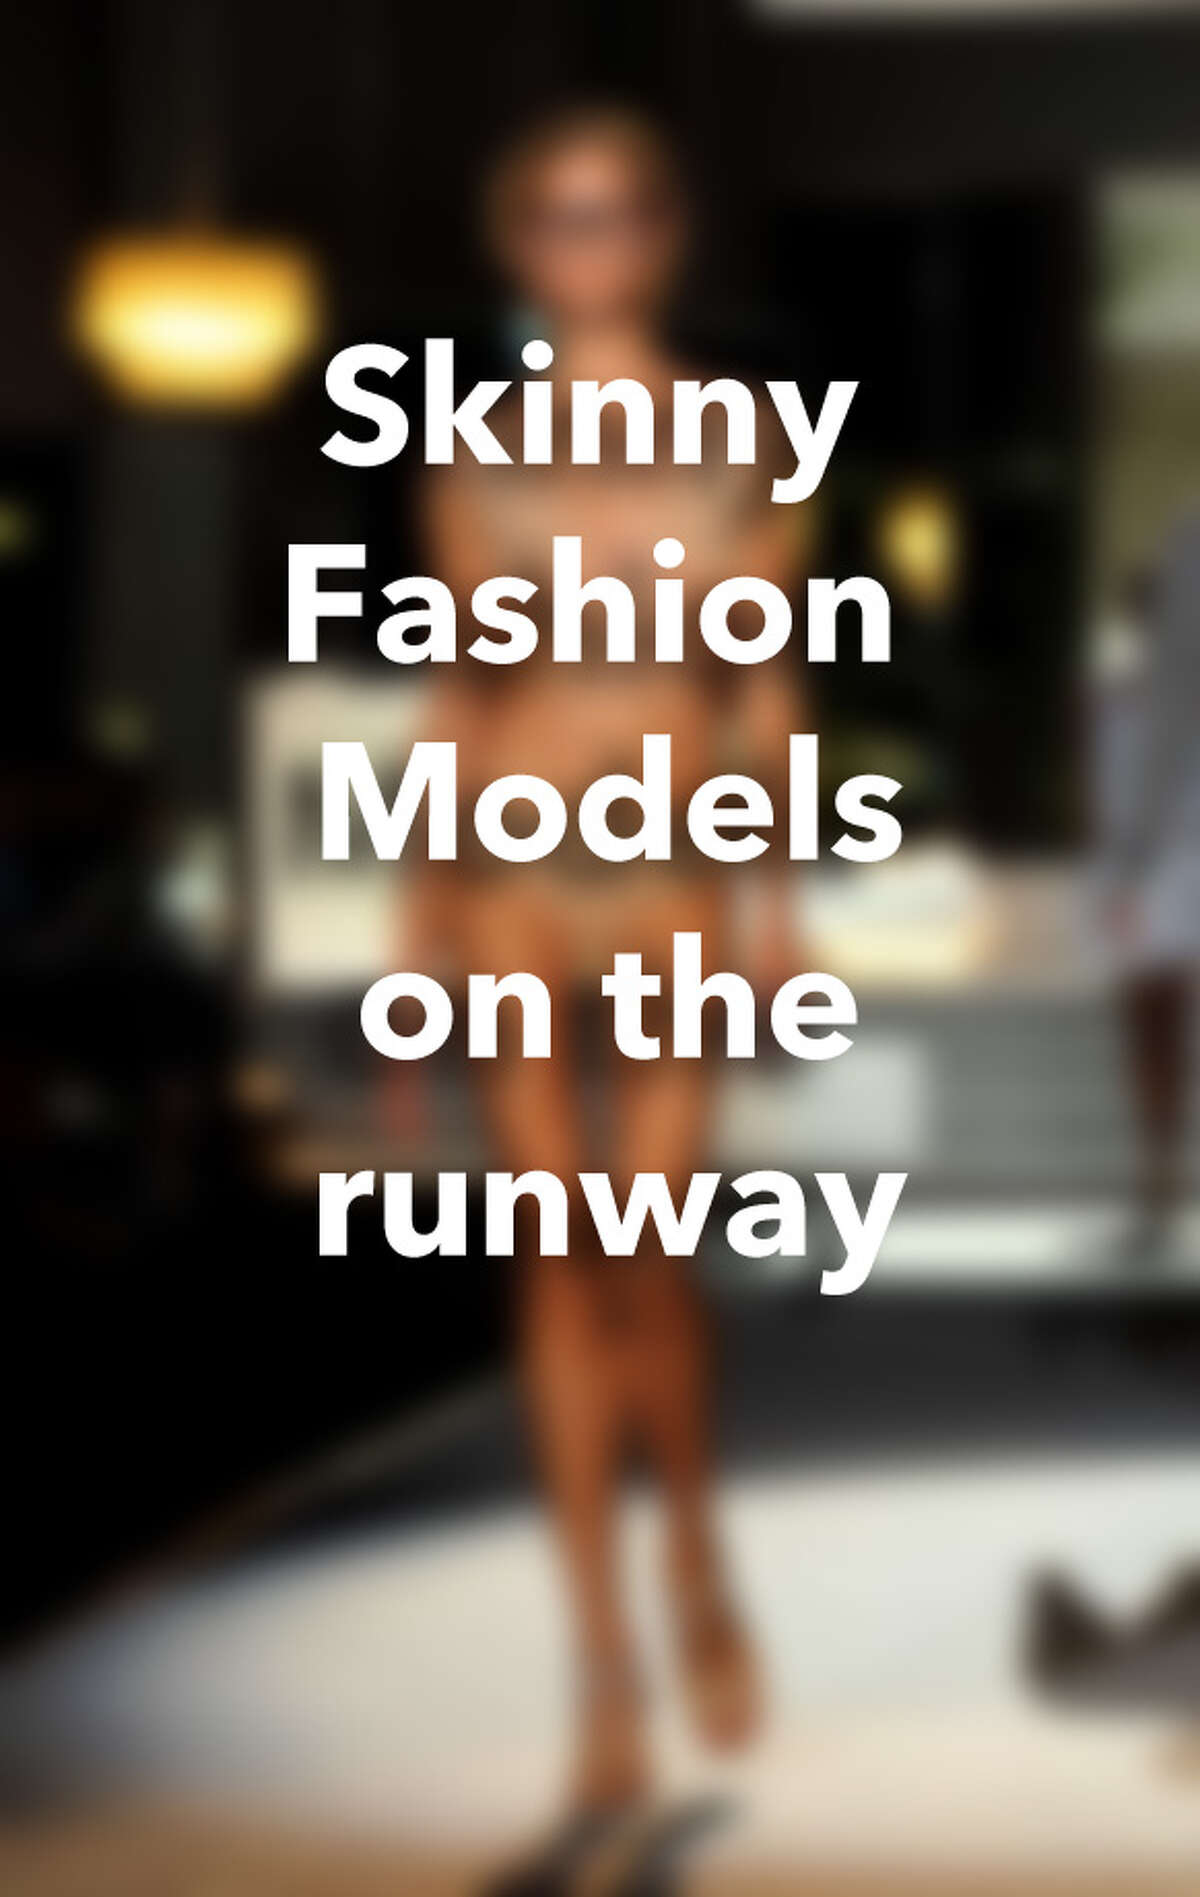 Skinny fashion models on the runway